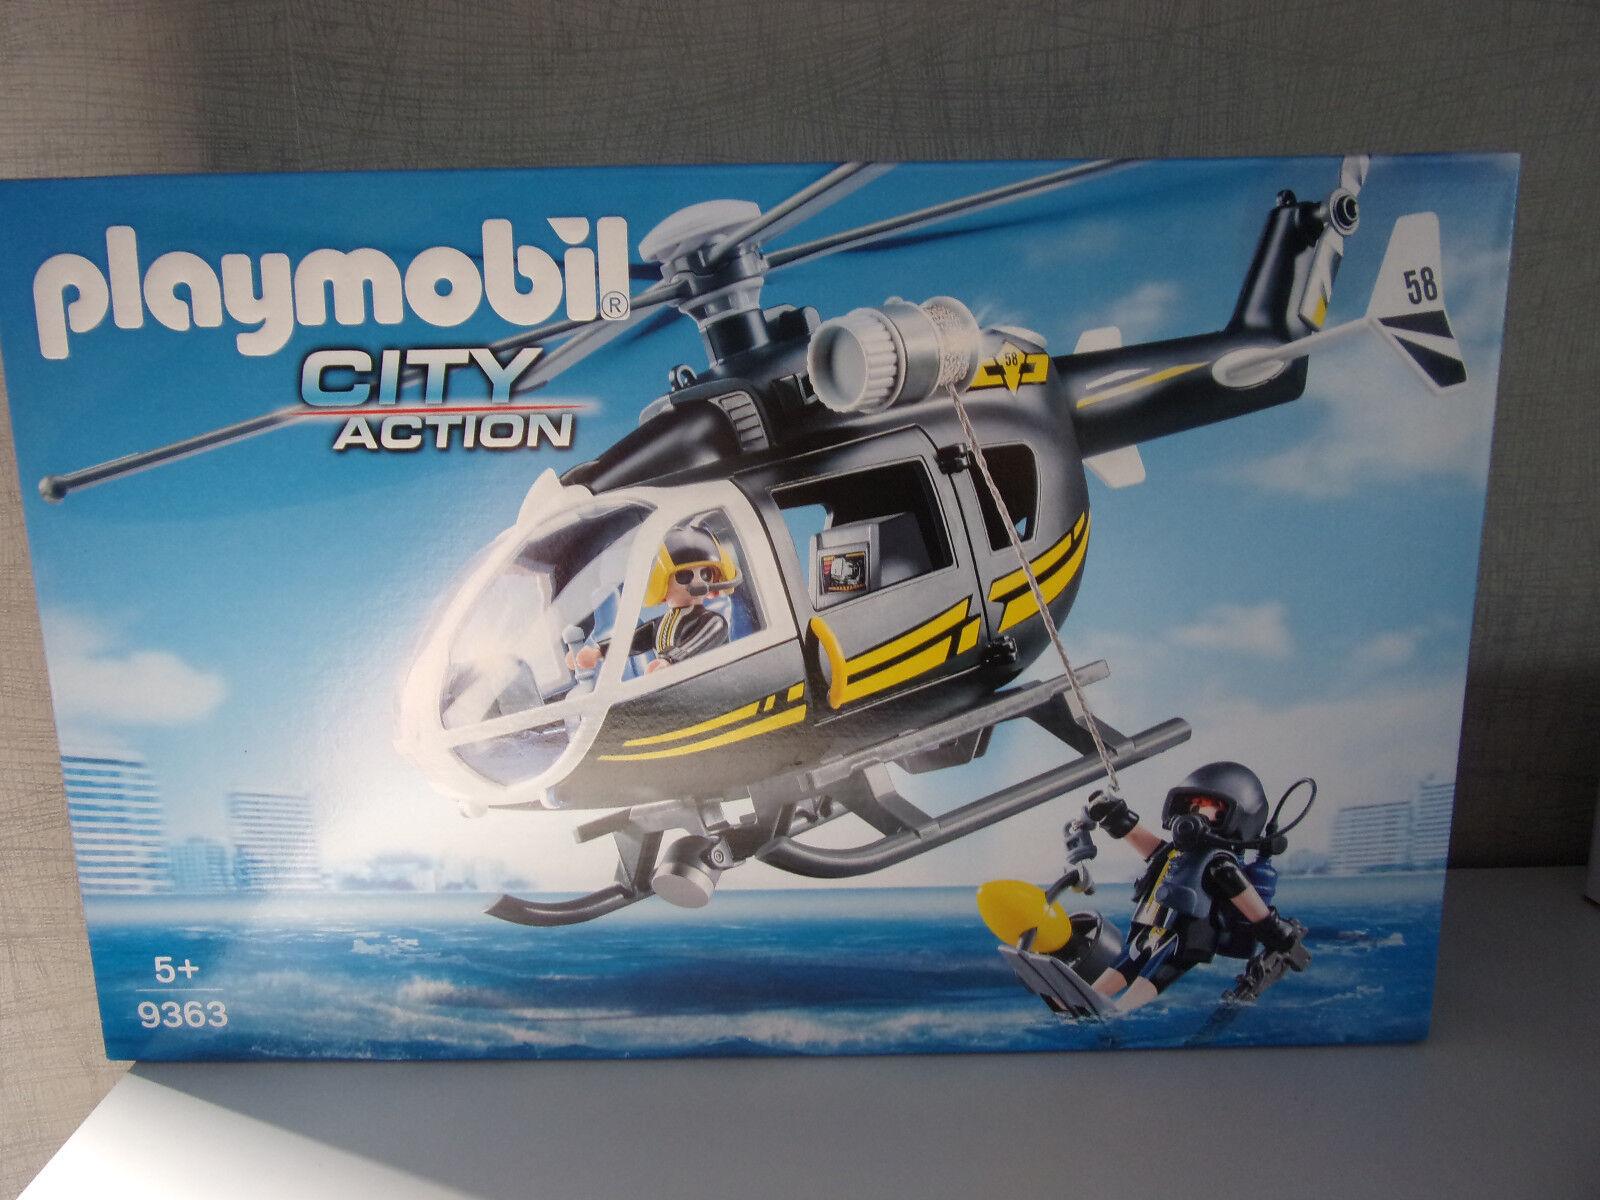 Playmobil City Action 9363 Sek Sek Sek Hélicoptère - Neuf et Emballage D'Origine 531e90